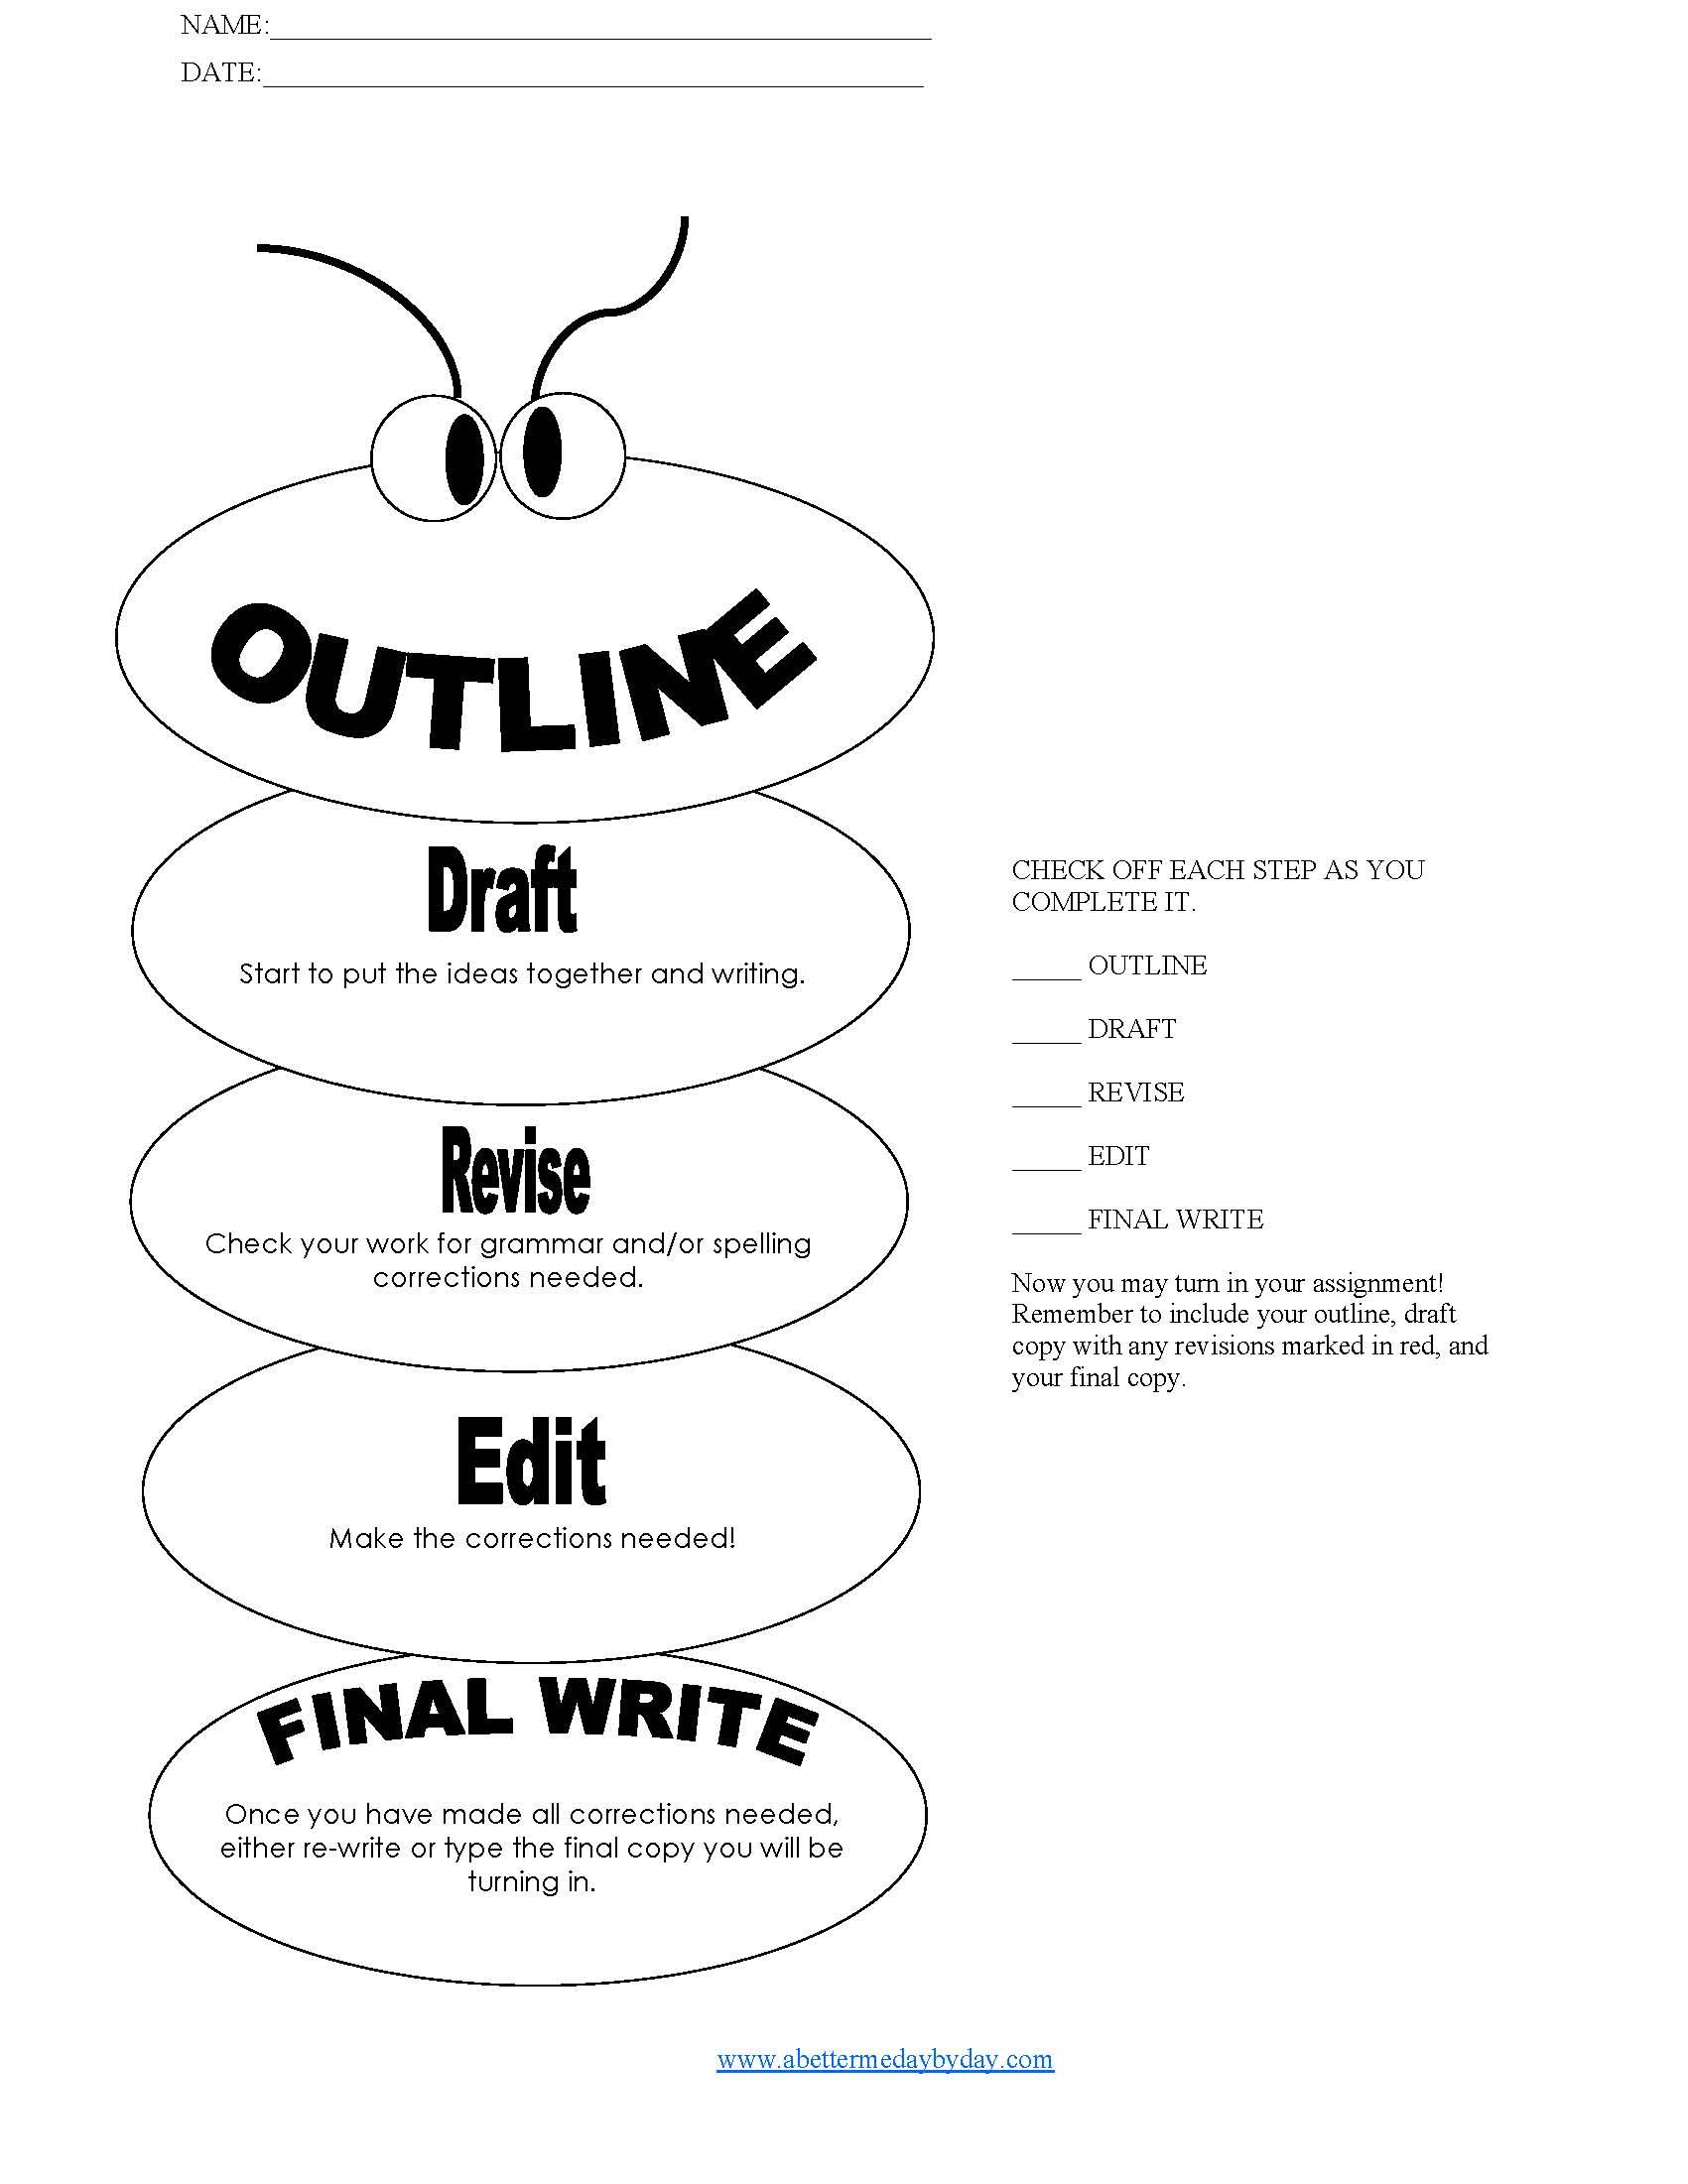 Writing Process Writing Outline Writing Process Checklist Essay Writing